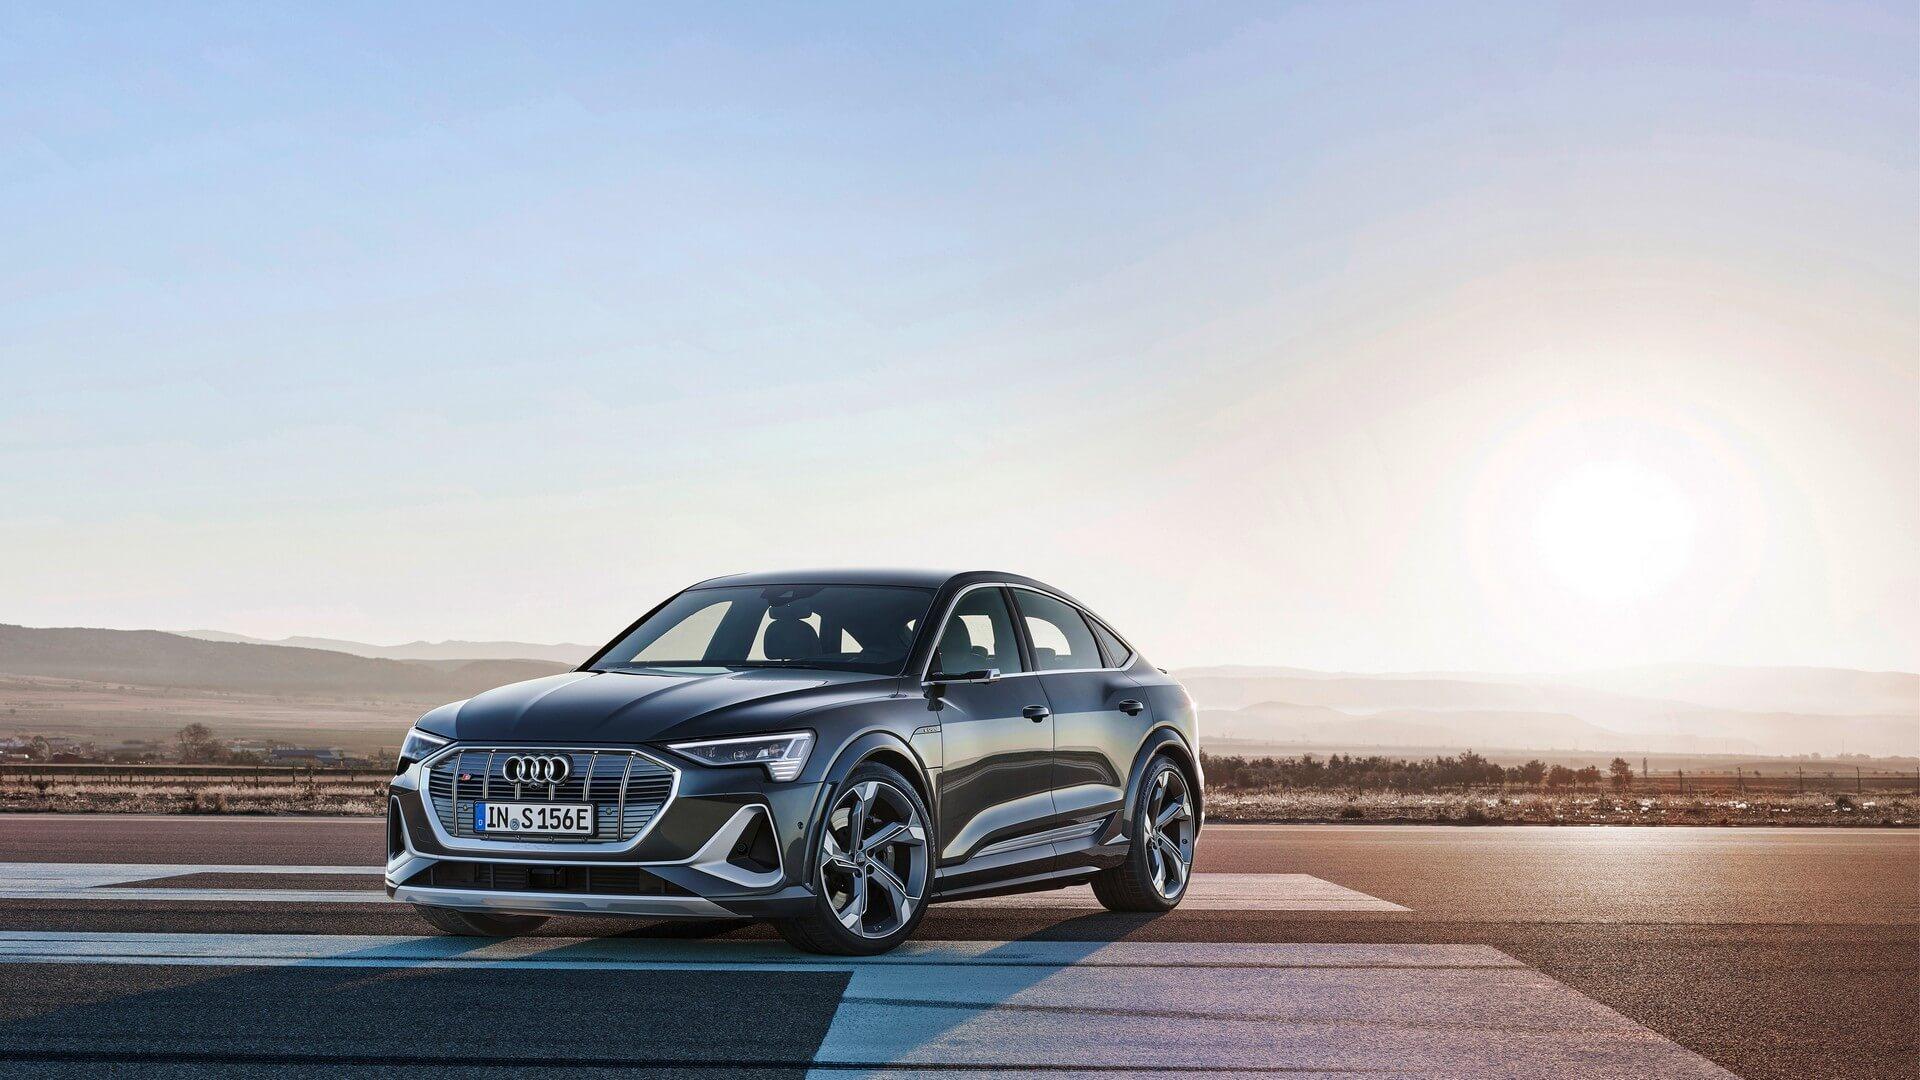 Audi-E-Tron-S-and-E-Tron-S-Sportback-2020-74